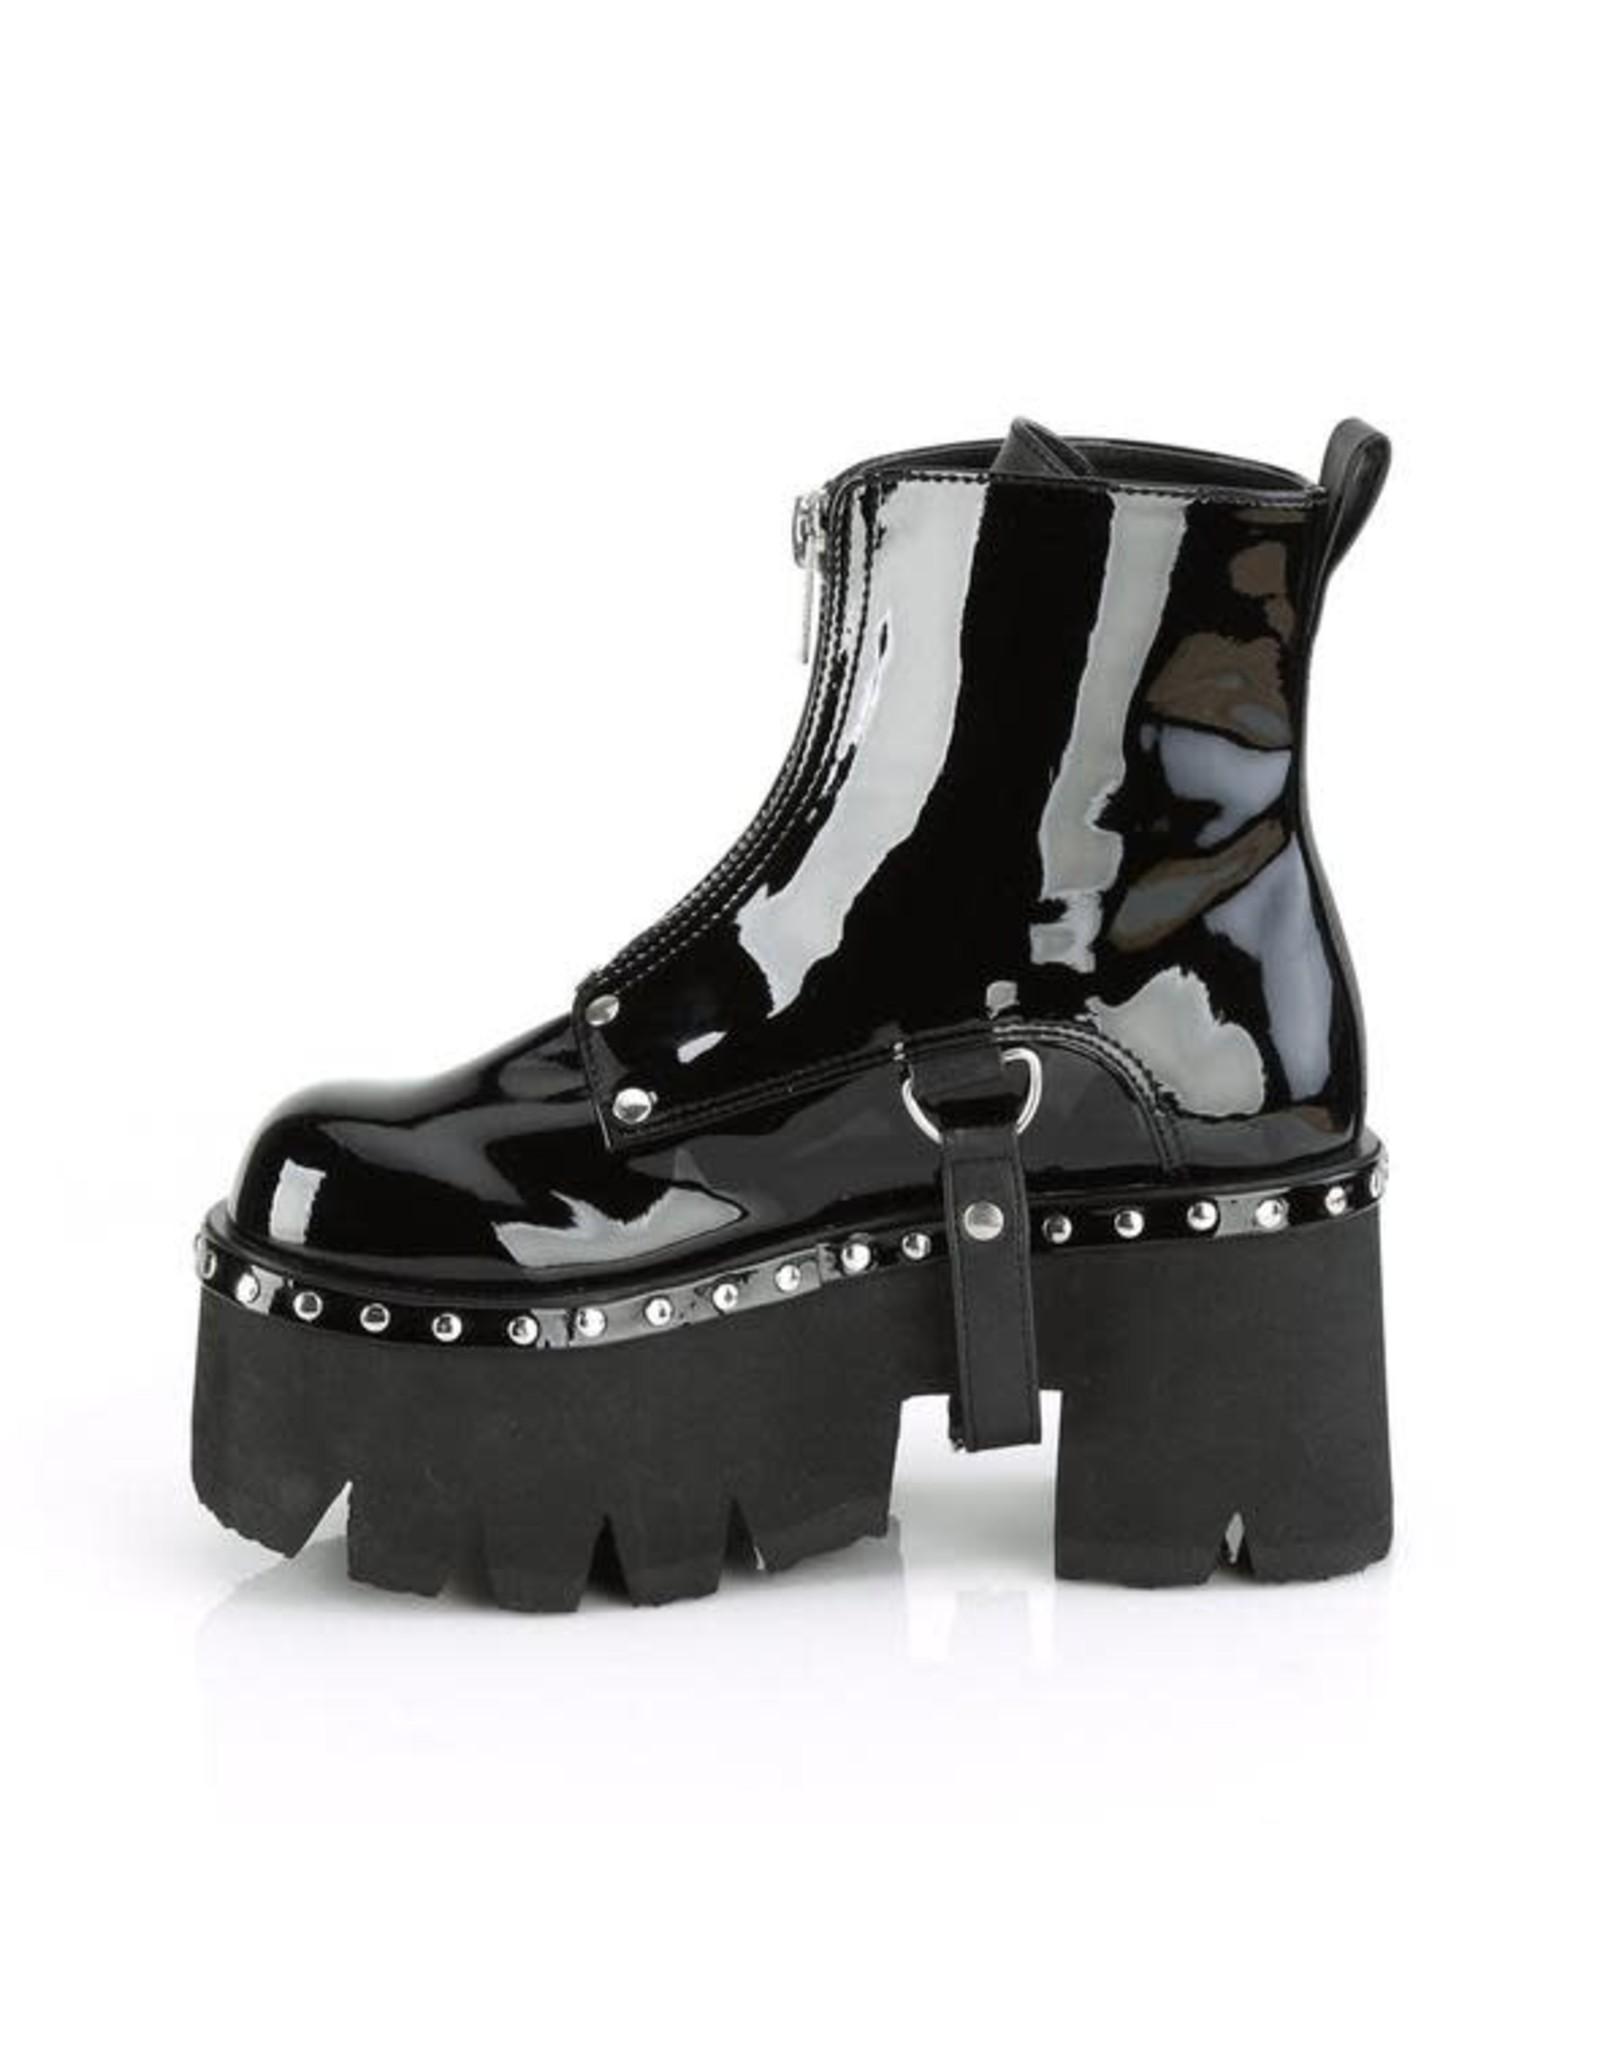 "DEMONIA ASHES-100 3 1/2"" Chunky Heel Platform Black Patent Vegan Leather Boot,Silver Stud Embellishments + D-Rings Harness Strap D39PB"